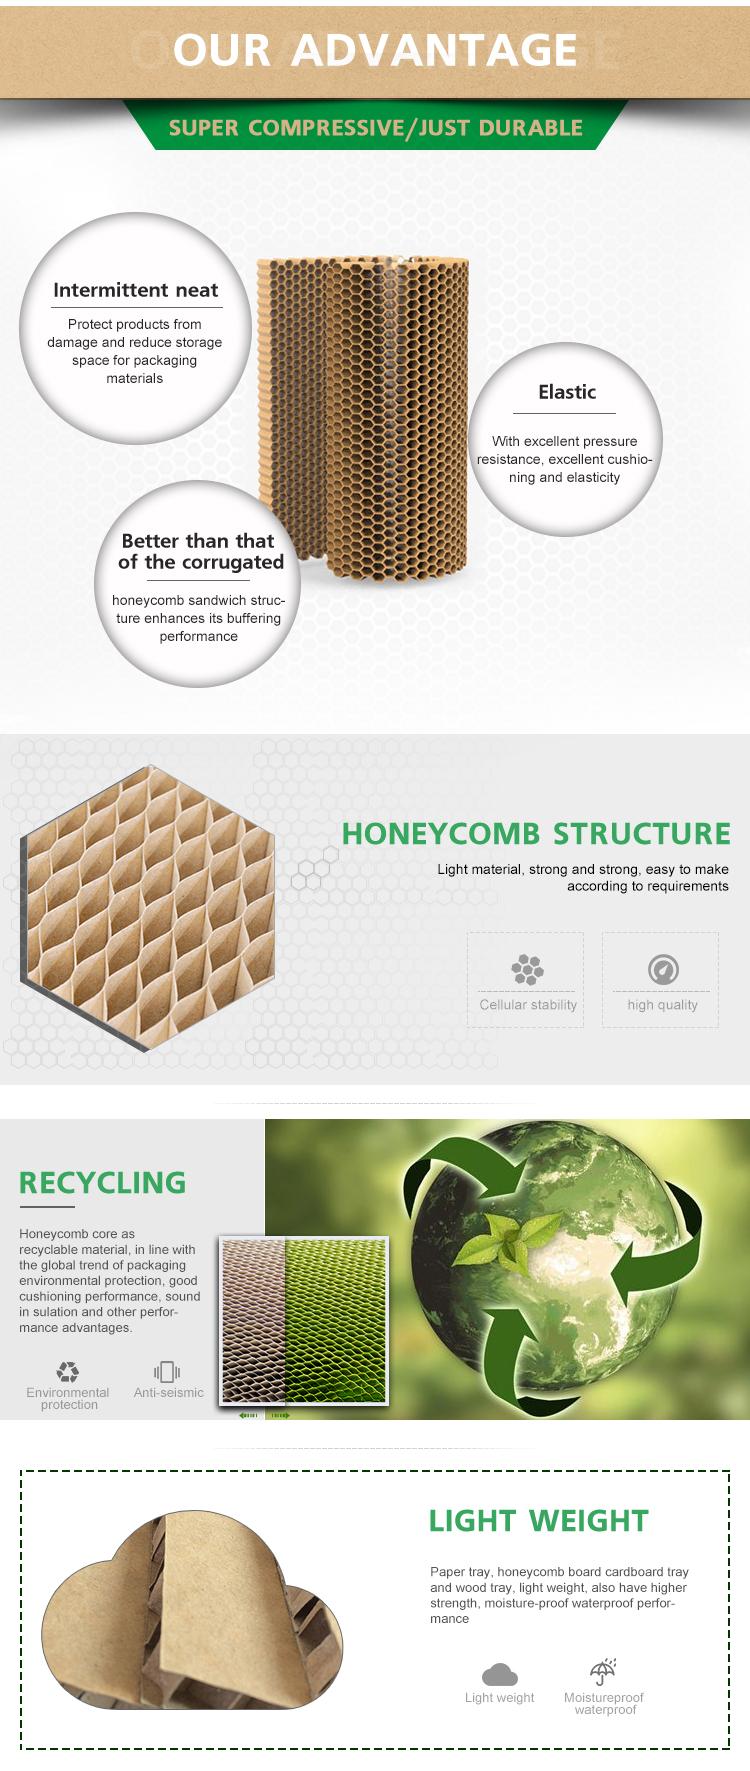 Beste Verkäufe Hohe Festigkeit Langlebig Hohe Qualität Honeycomb Papier Borad Blatt Honeycomb Core Sandwich Panel